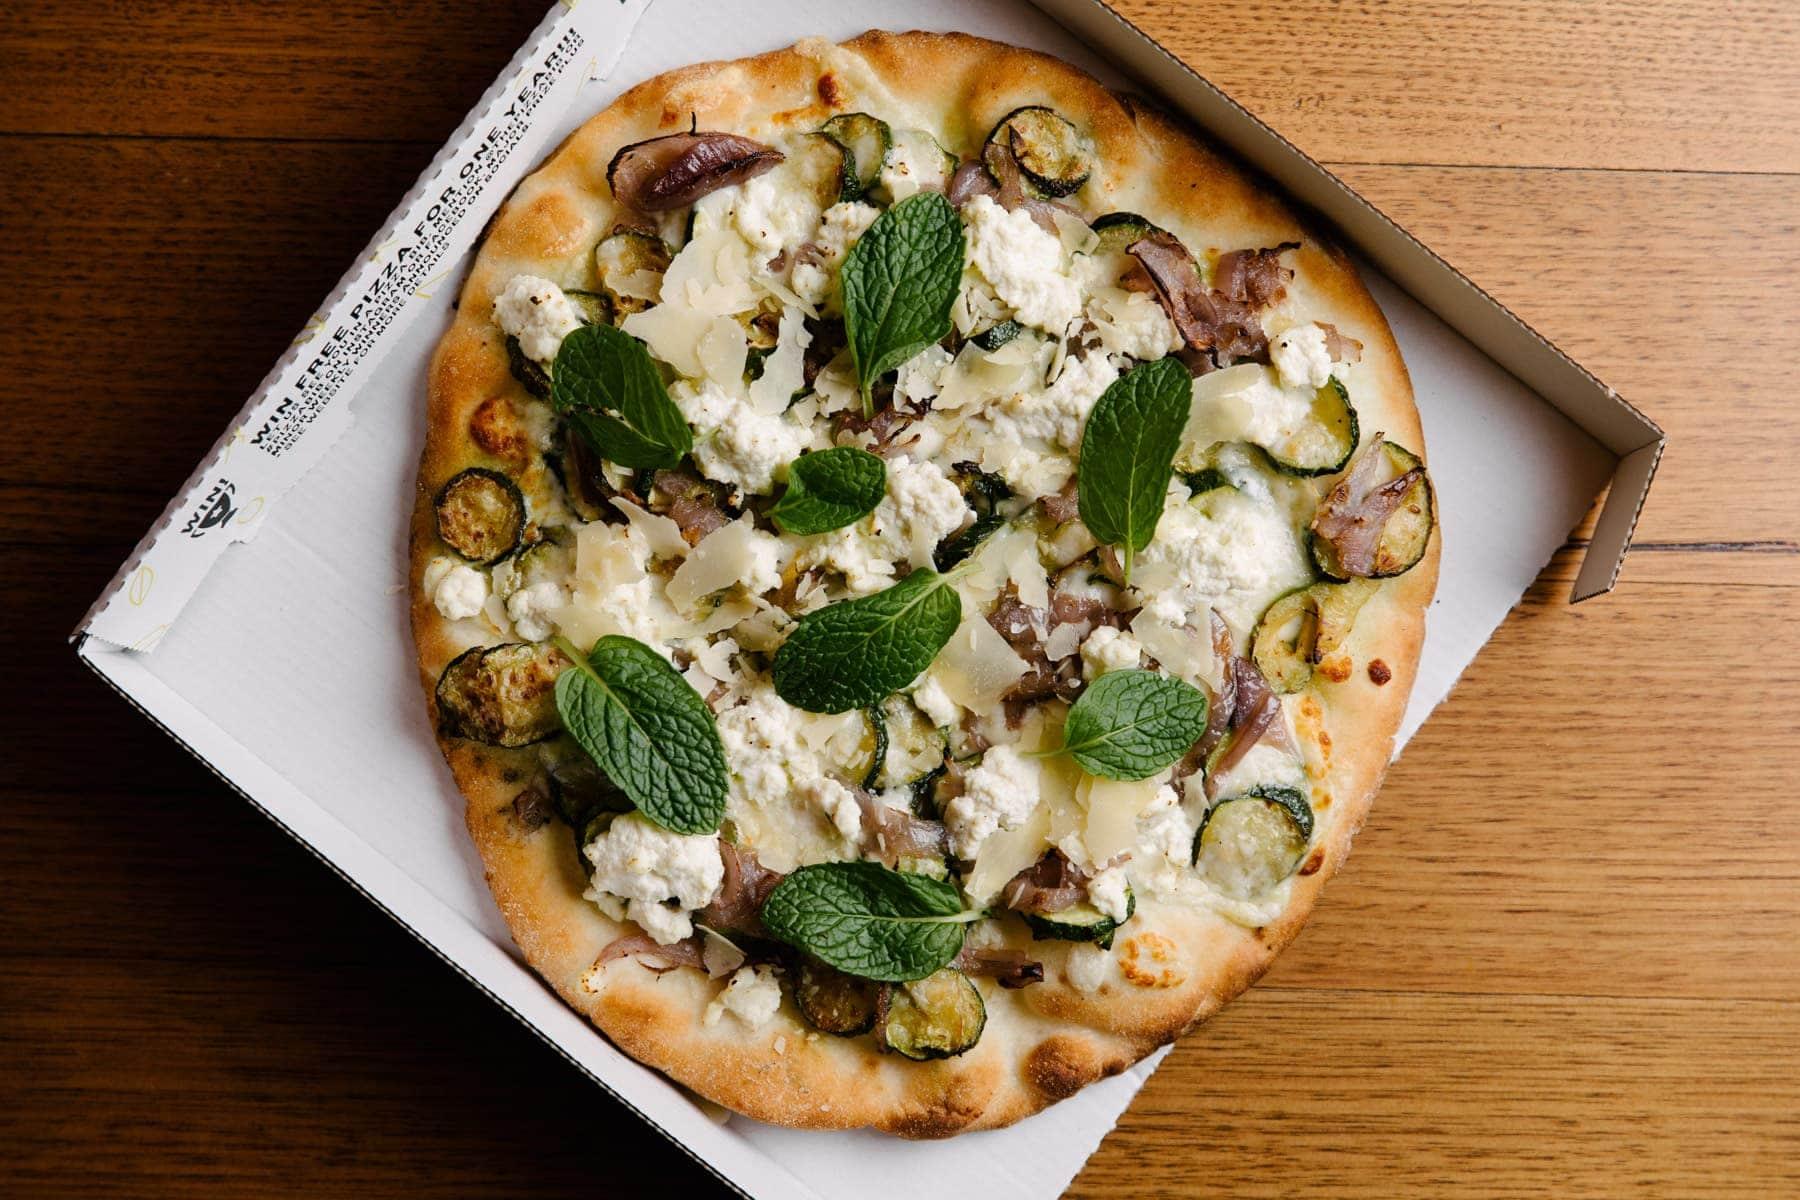 Ricotta Pizza - Mozzarella / Fresh Ricotta / Zucchini / Mint / Caramelised Onions / Shaved Parmesan / Provolone